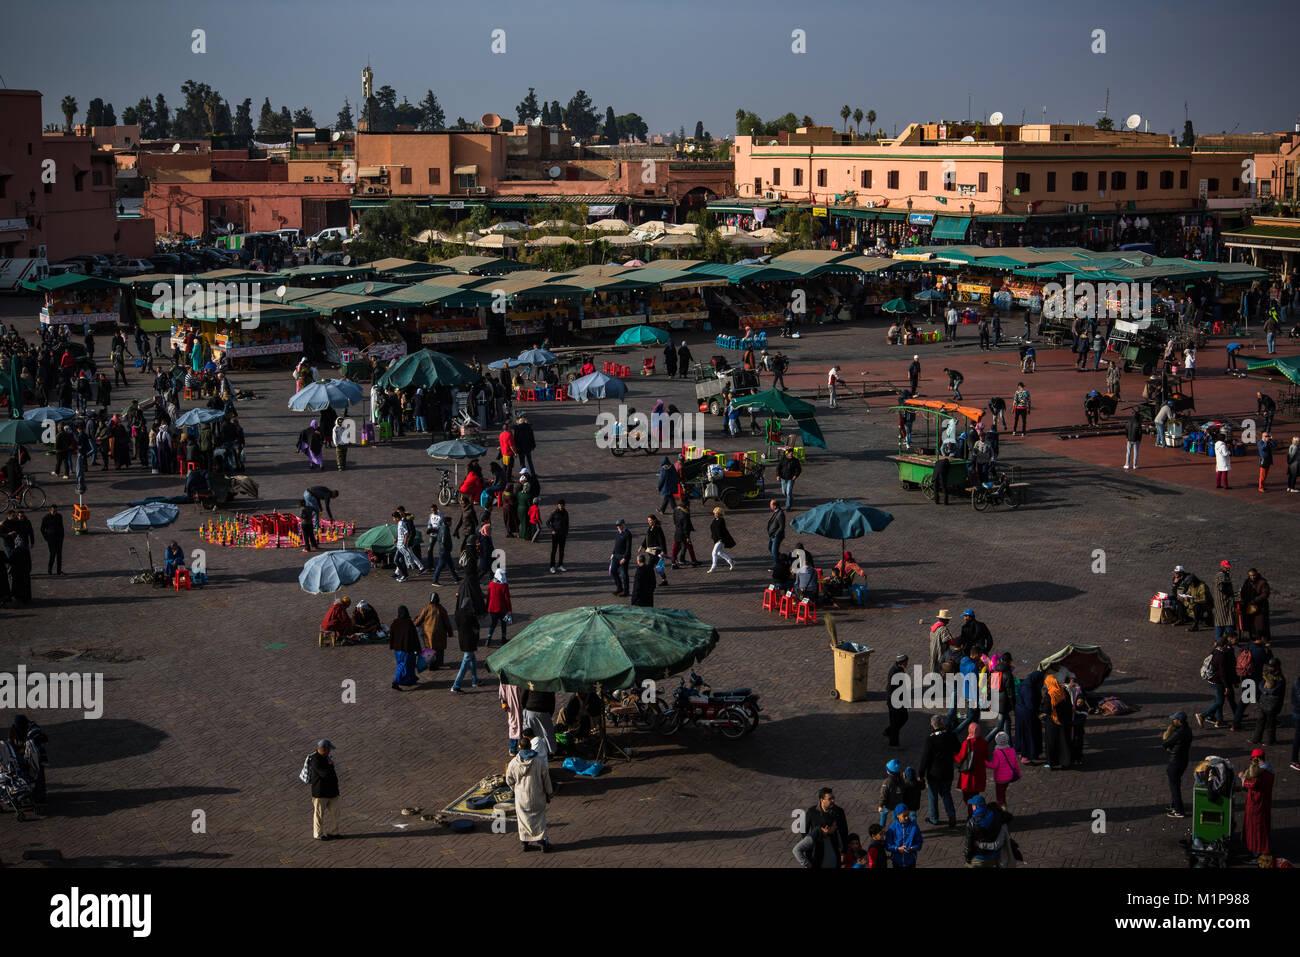 Marrakech,Morocco - January 2018:  Food stalls on Jamma el Fna market square in Marrakesh,Morocco. Stock Photo